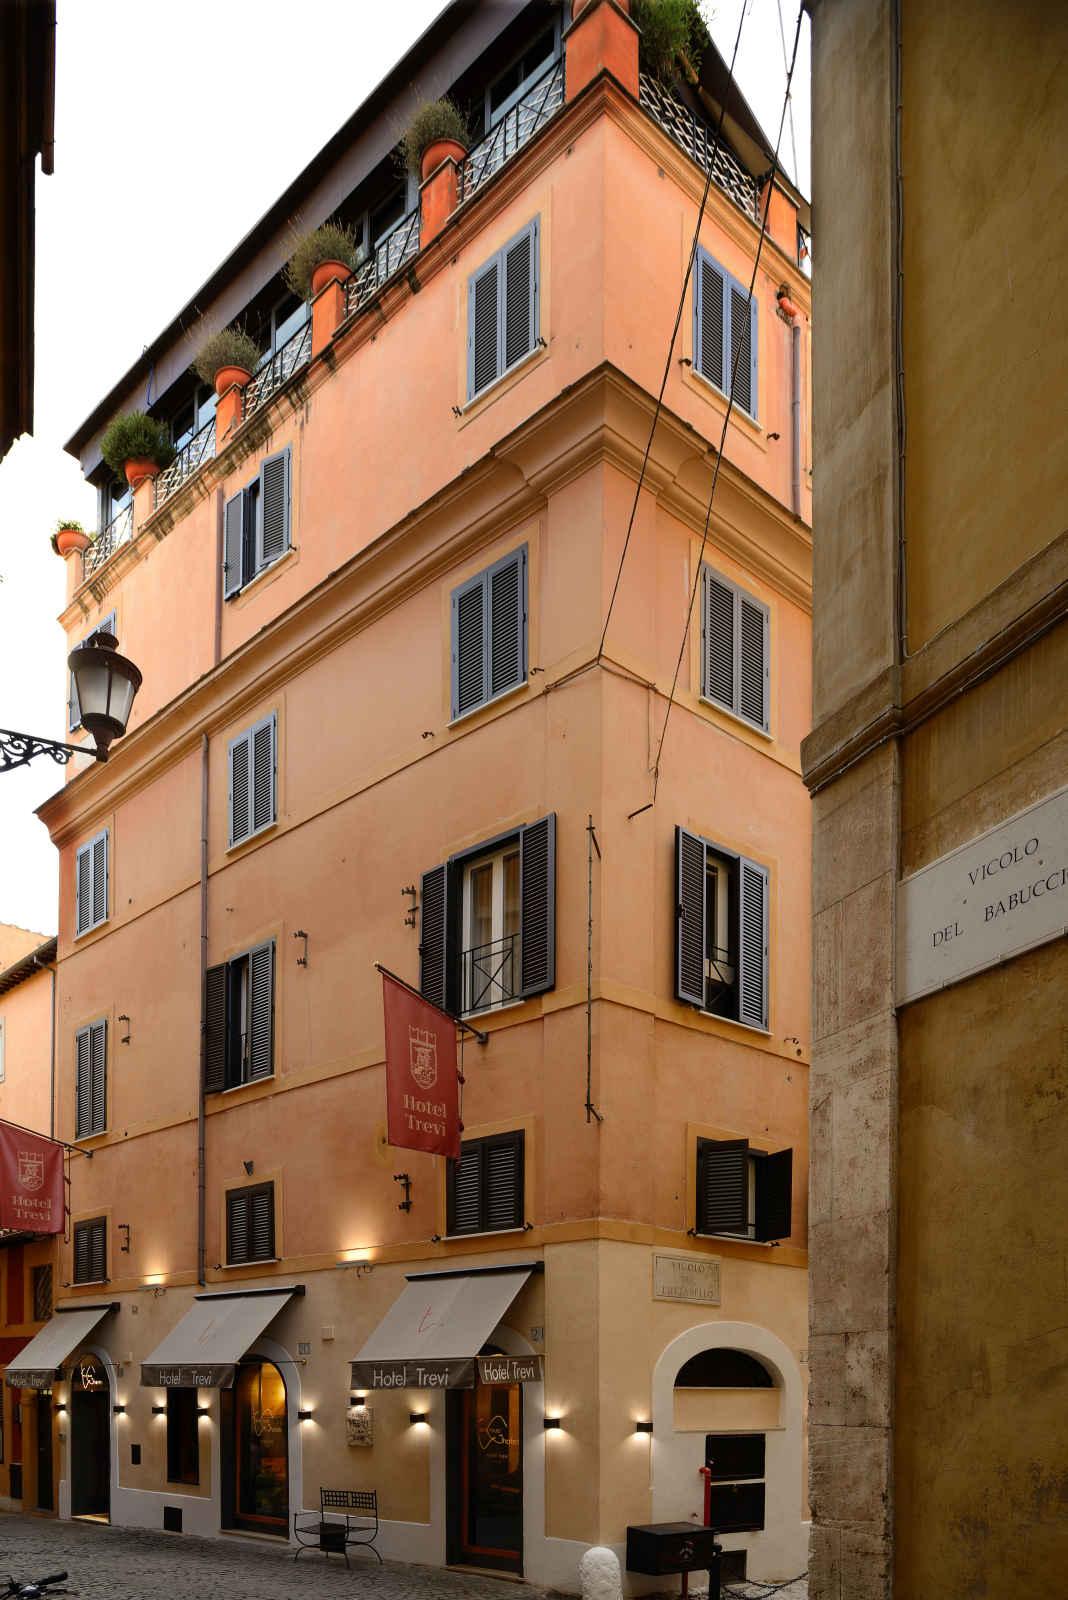 Séjour Italie - Hotel Trevi - 3*